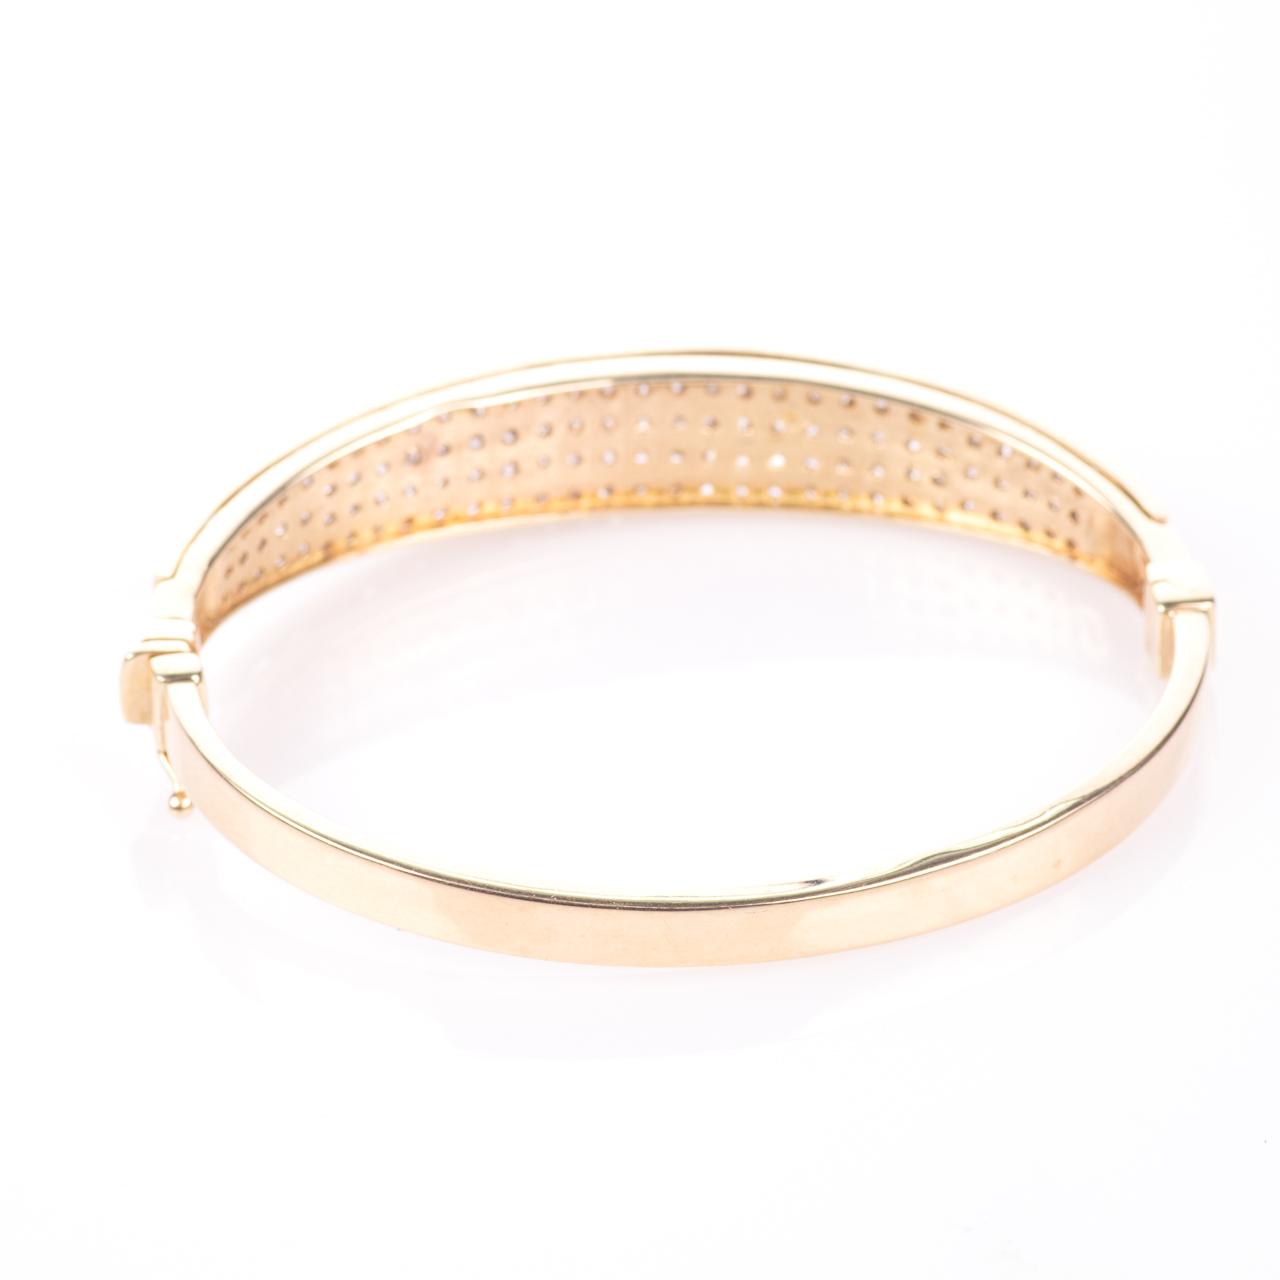 9ct Gold 4ct Diamond Heart Bangle Bracelet - Image 6 of 7